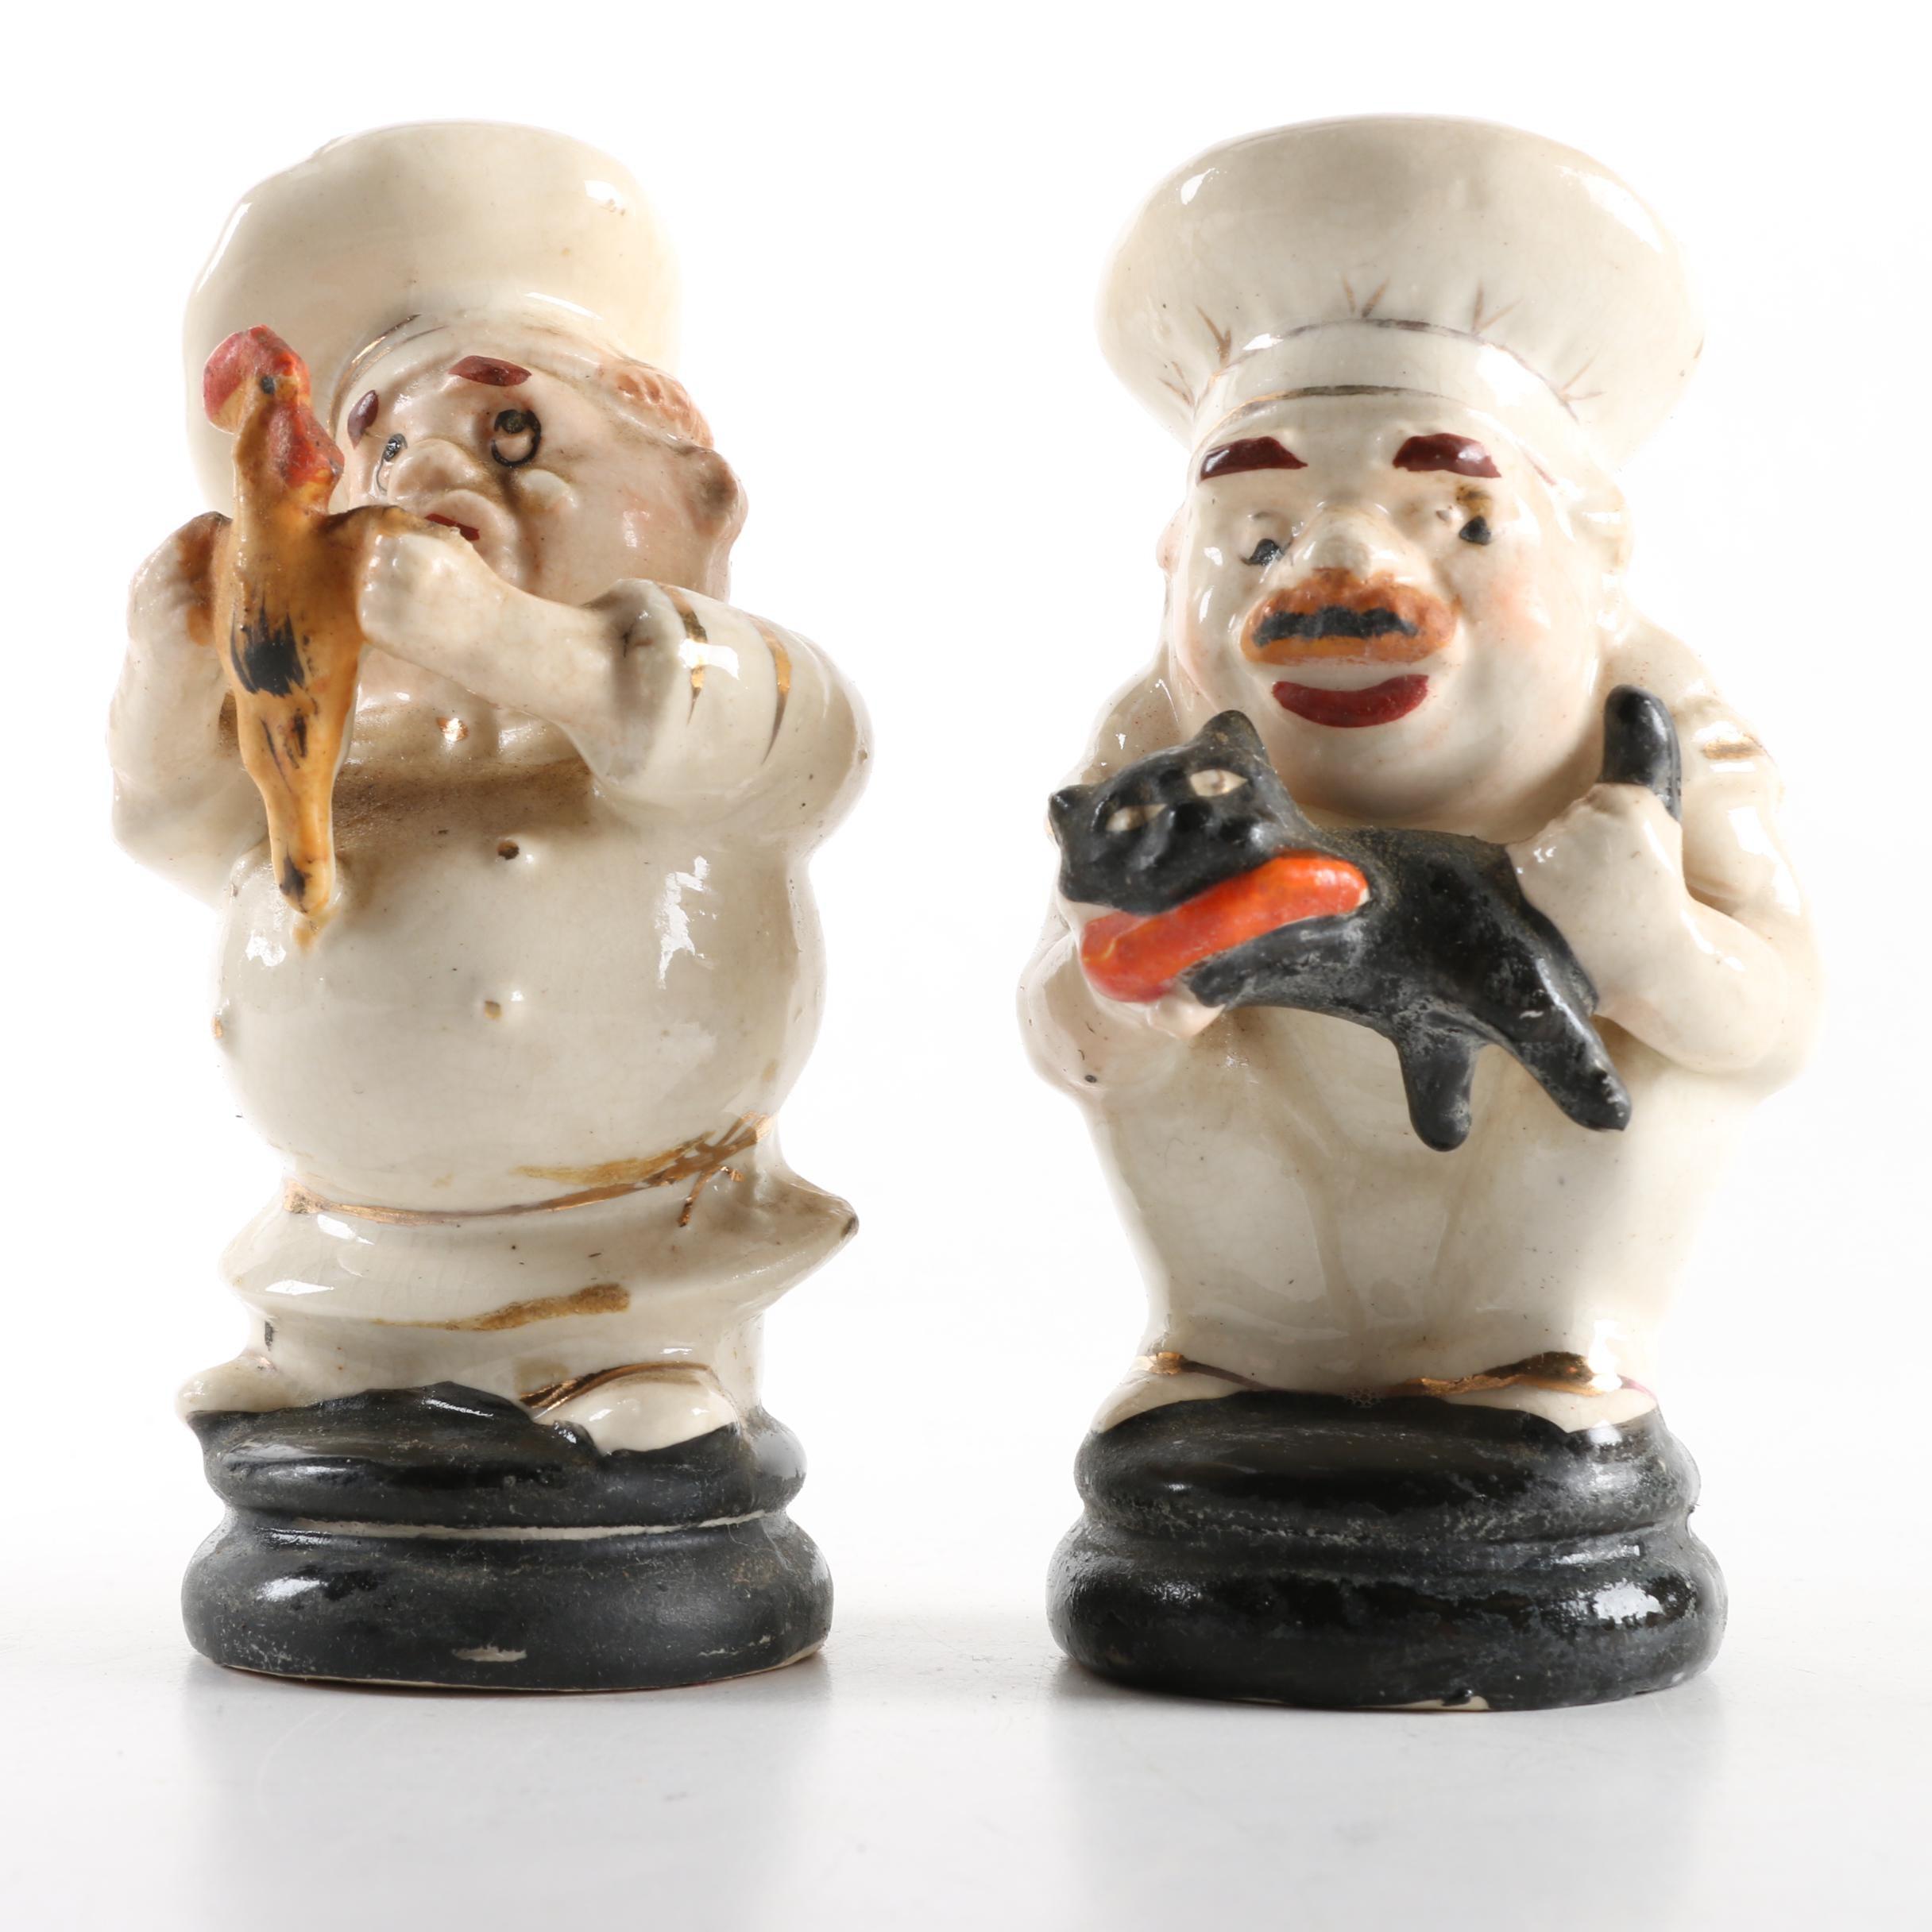 Pair of Ceramic Chef Salt and Pepper Shakers